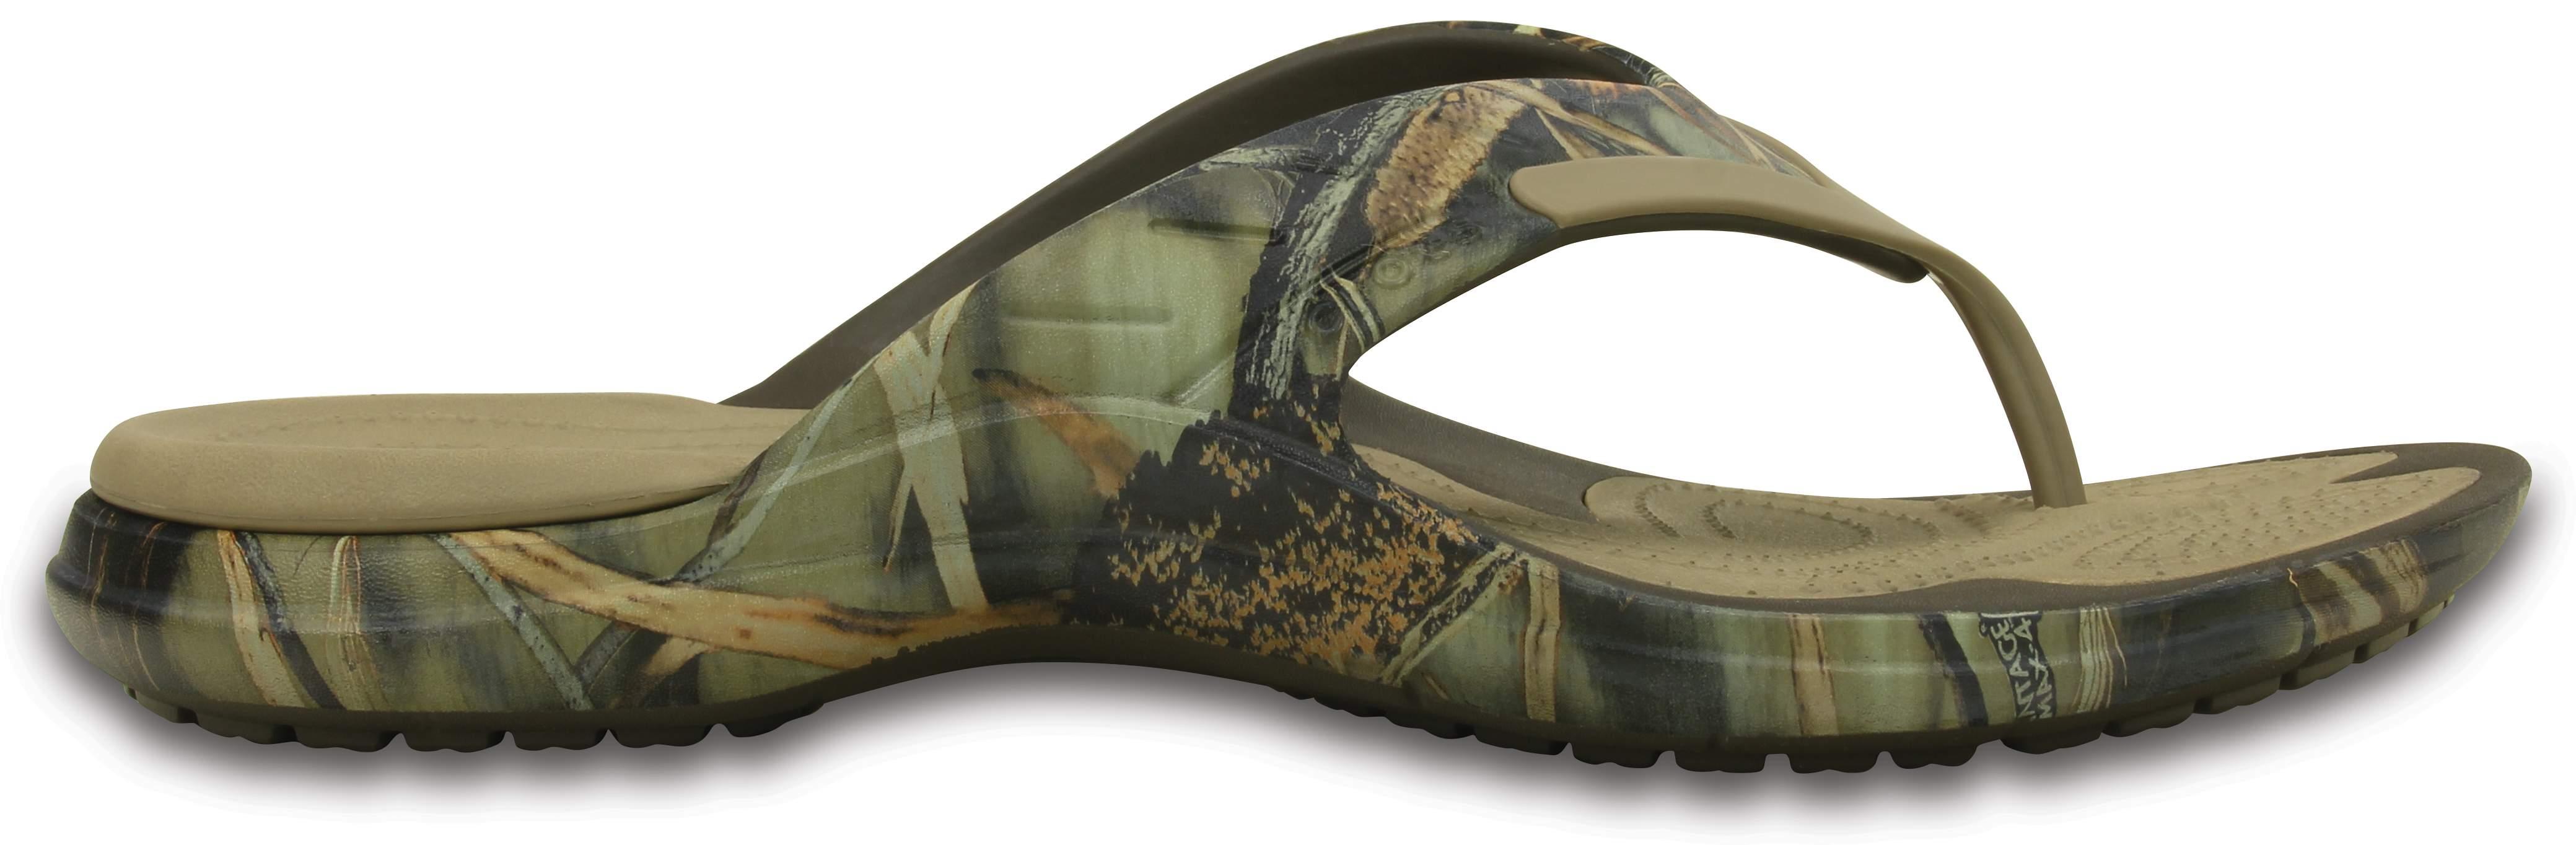 Crocs MODI Sport Realtree Max-4 Flip Flop Sandal